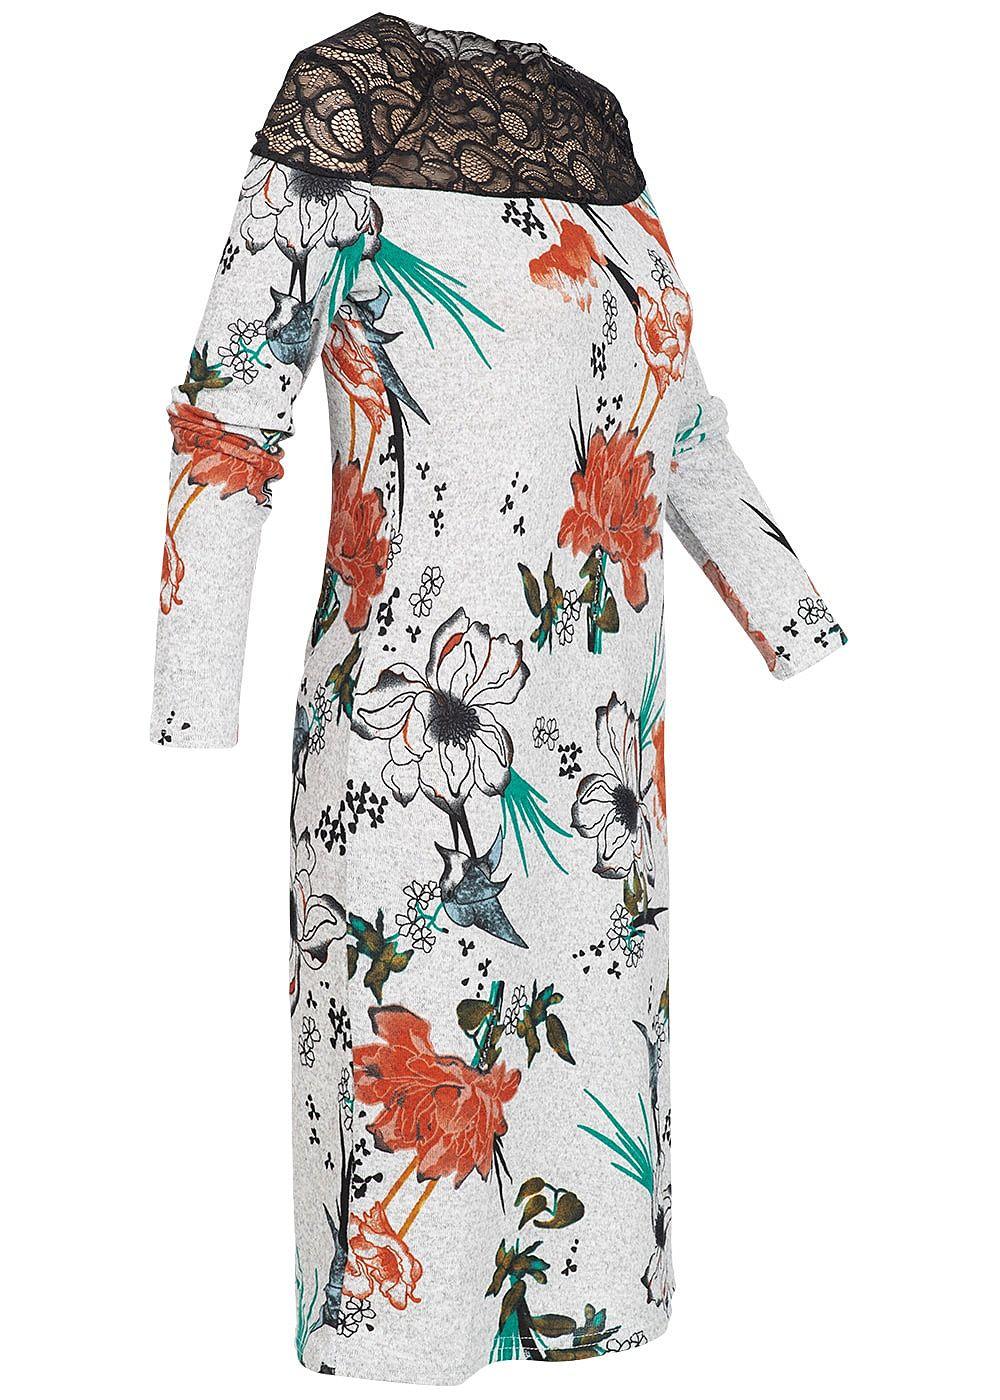 ONLY Damen Kleid Spitze oben Florales Muster hell grau ...